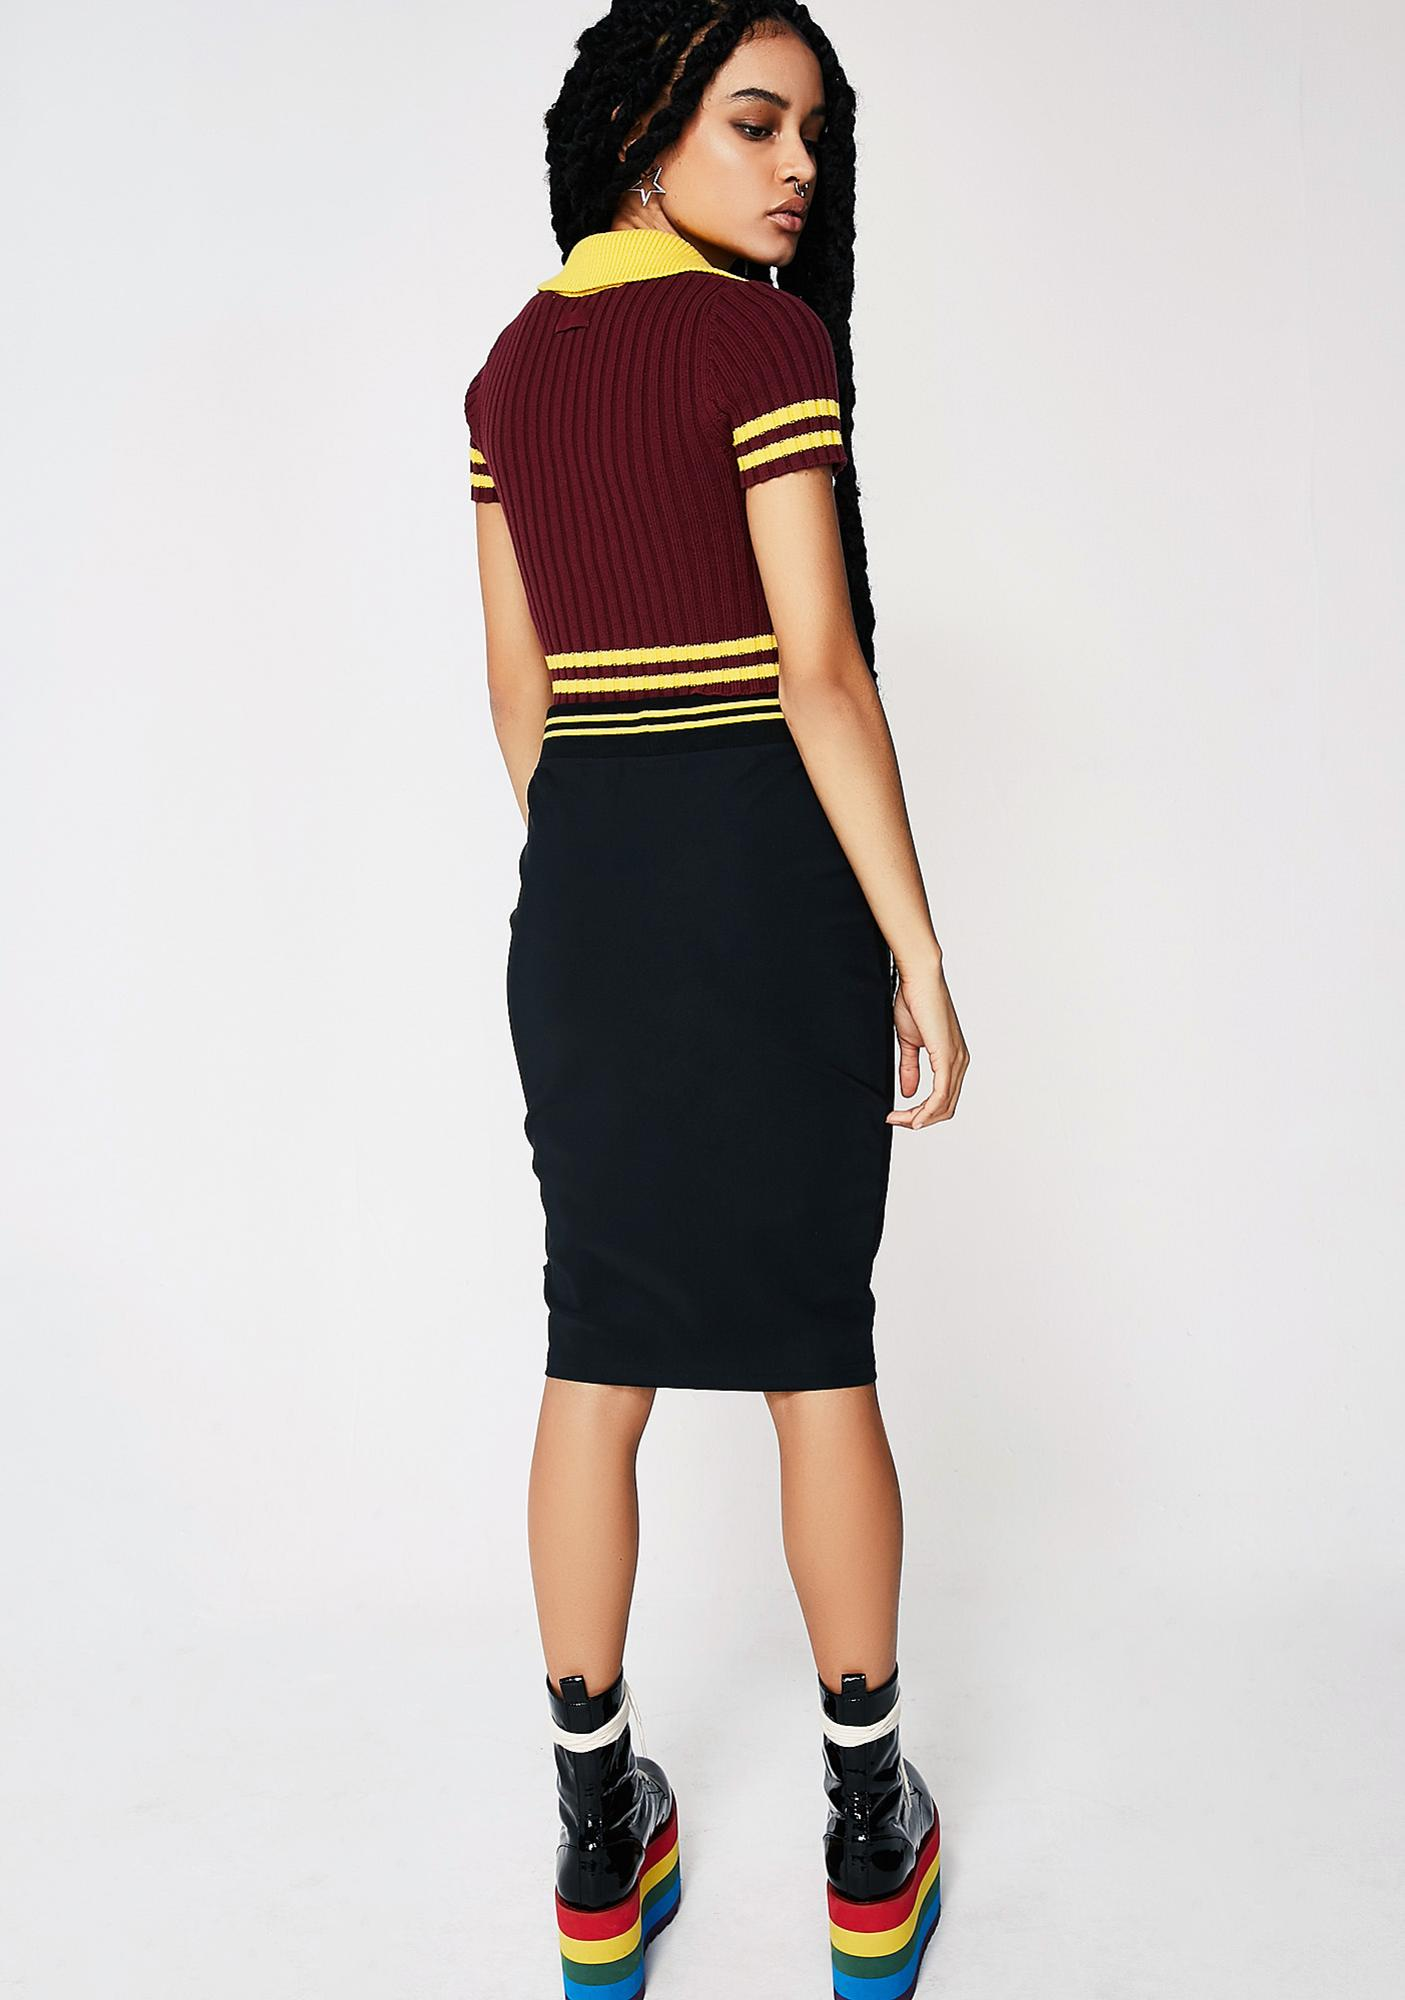 PUMA FENTY PUMA By Rihanna Varsity Pencil Skirt